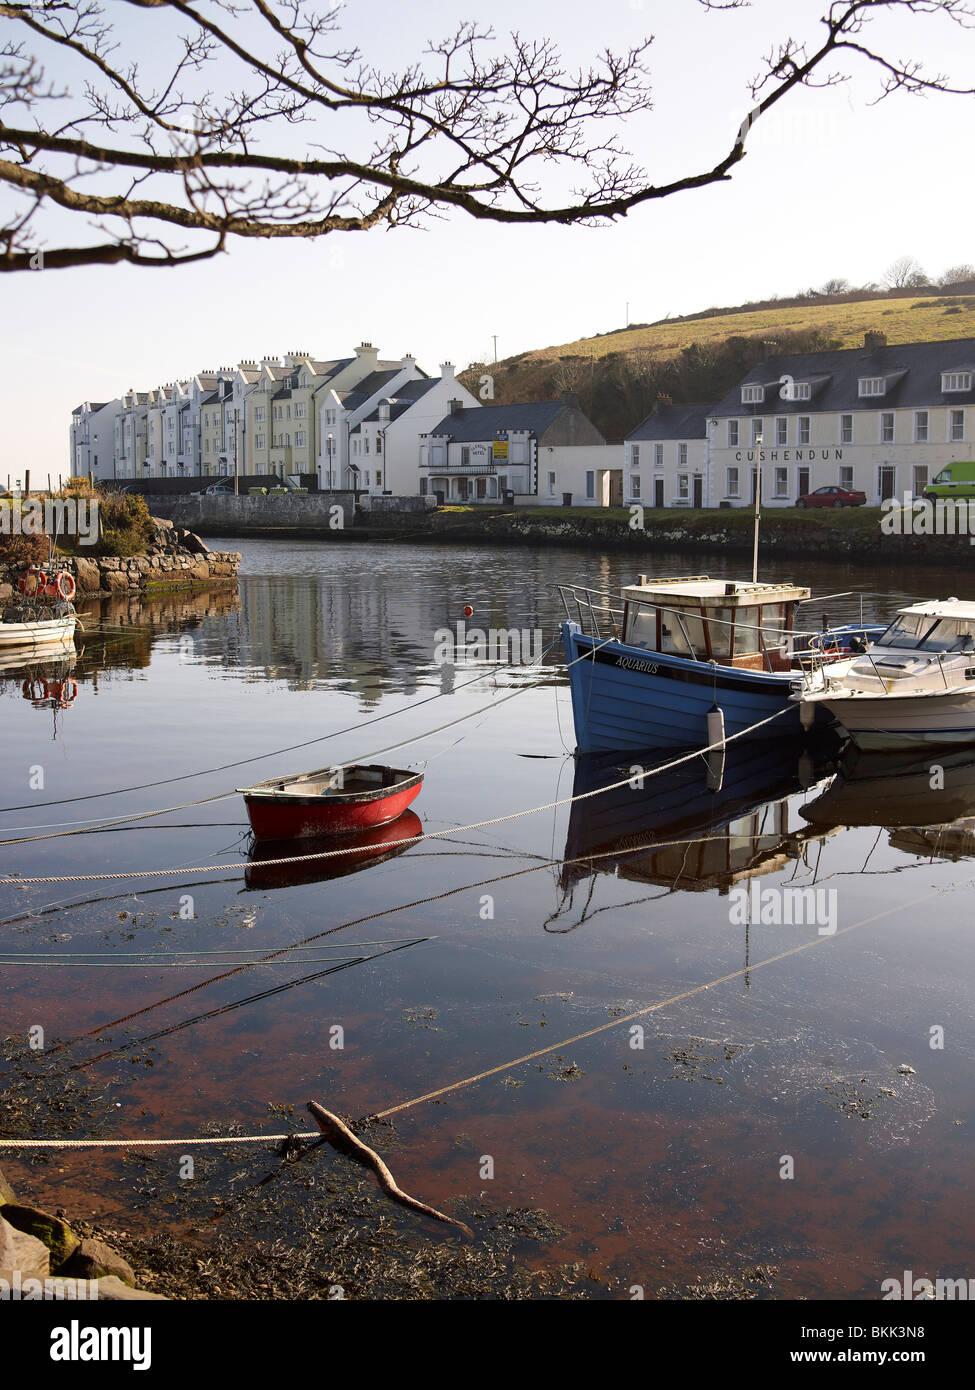 Cushenden Harbour, County Antrim, Northern Ireland - Stock Image